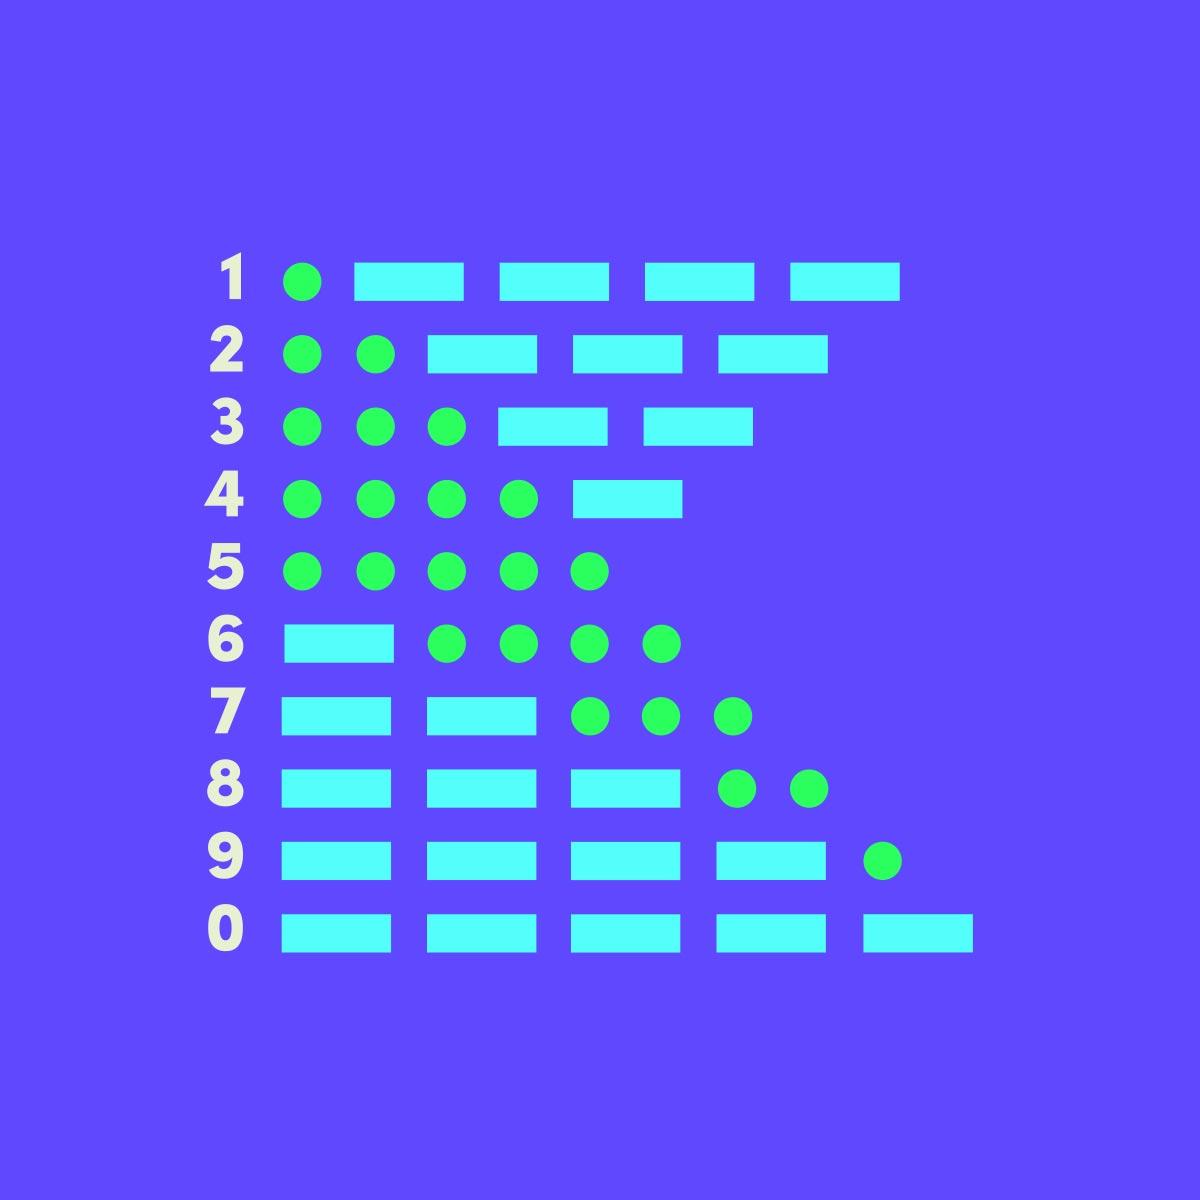 morse_code_GOTO creative_stockport